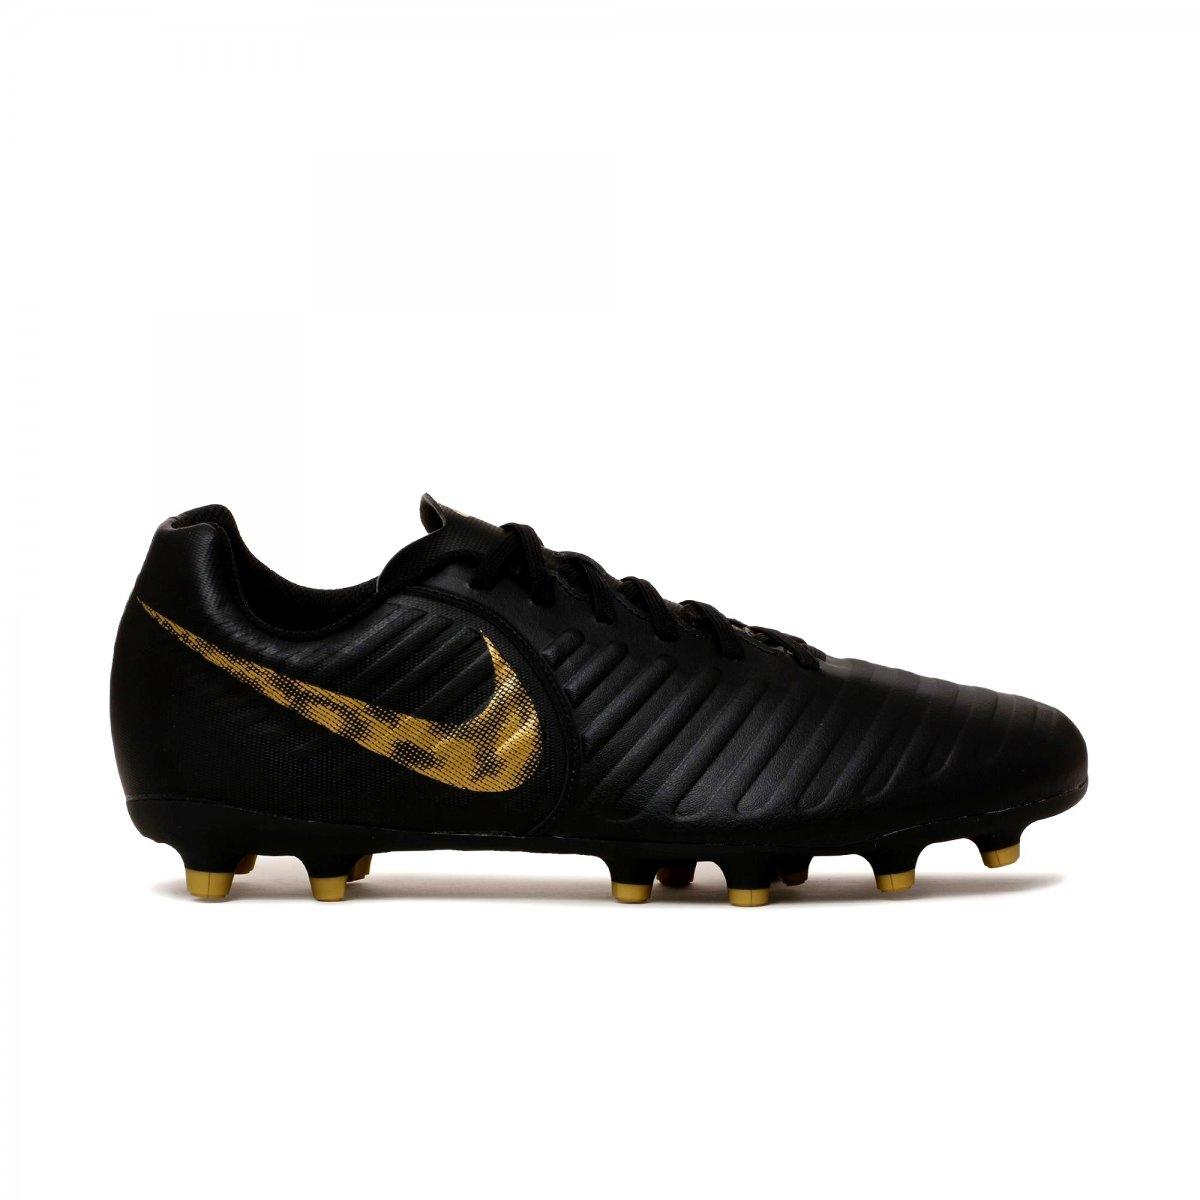 2e21ab20fe Chuteira Masculina Campo Nike Legend 7 Club AO2597-077 - Preto ...